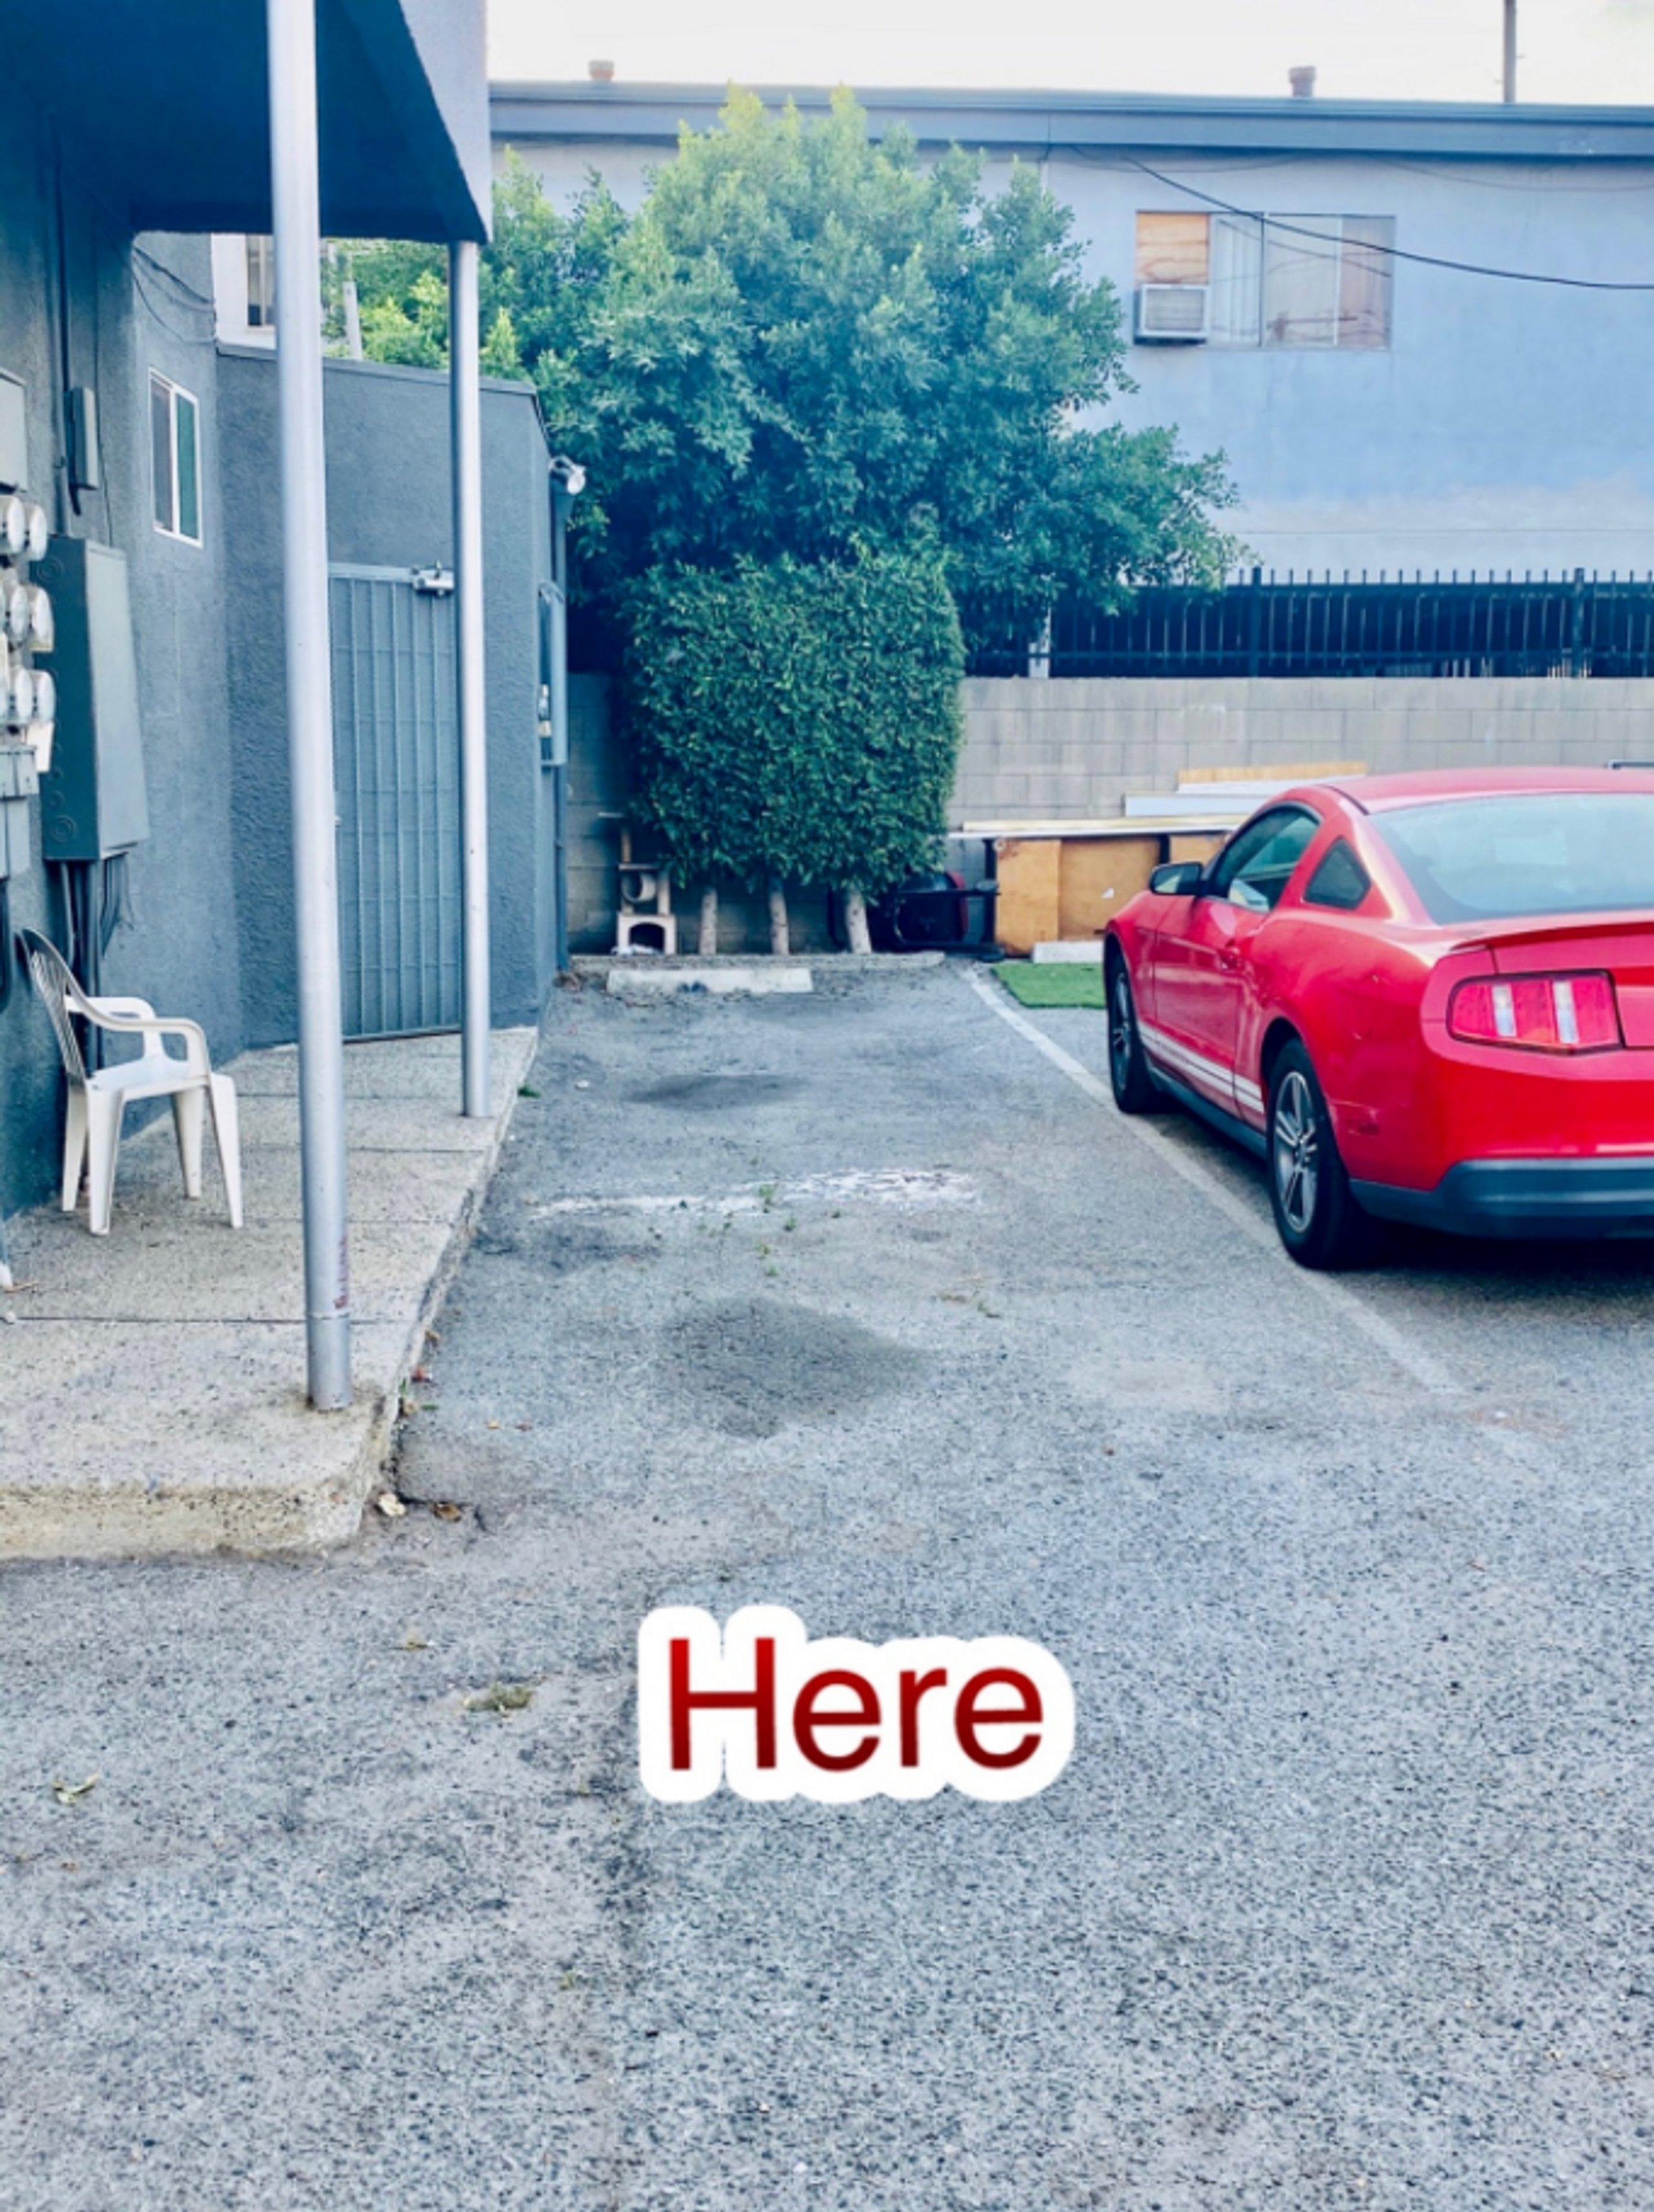 35x10 Parking Lot self storage unit